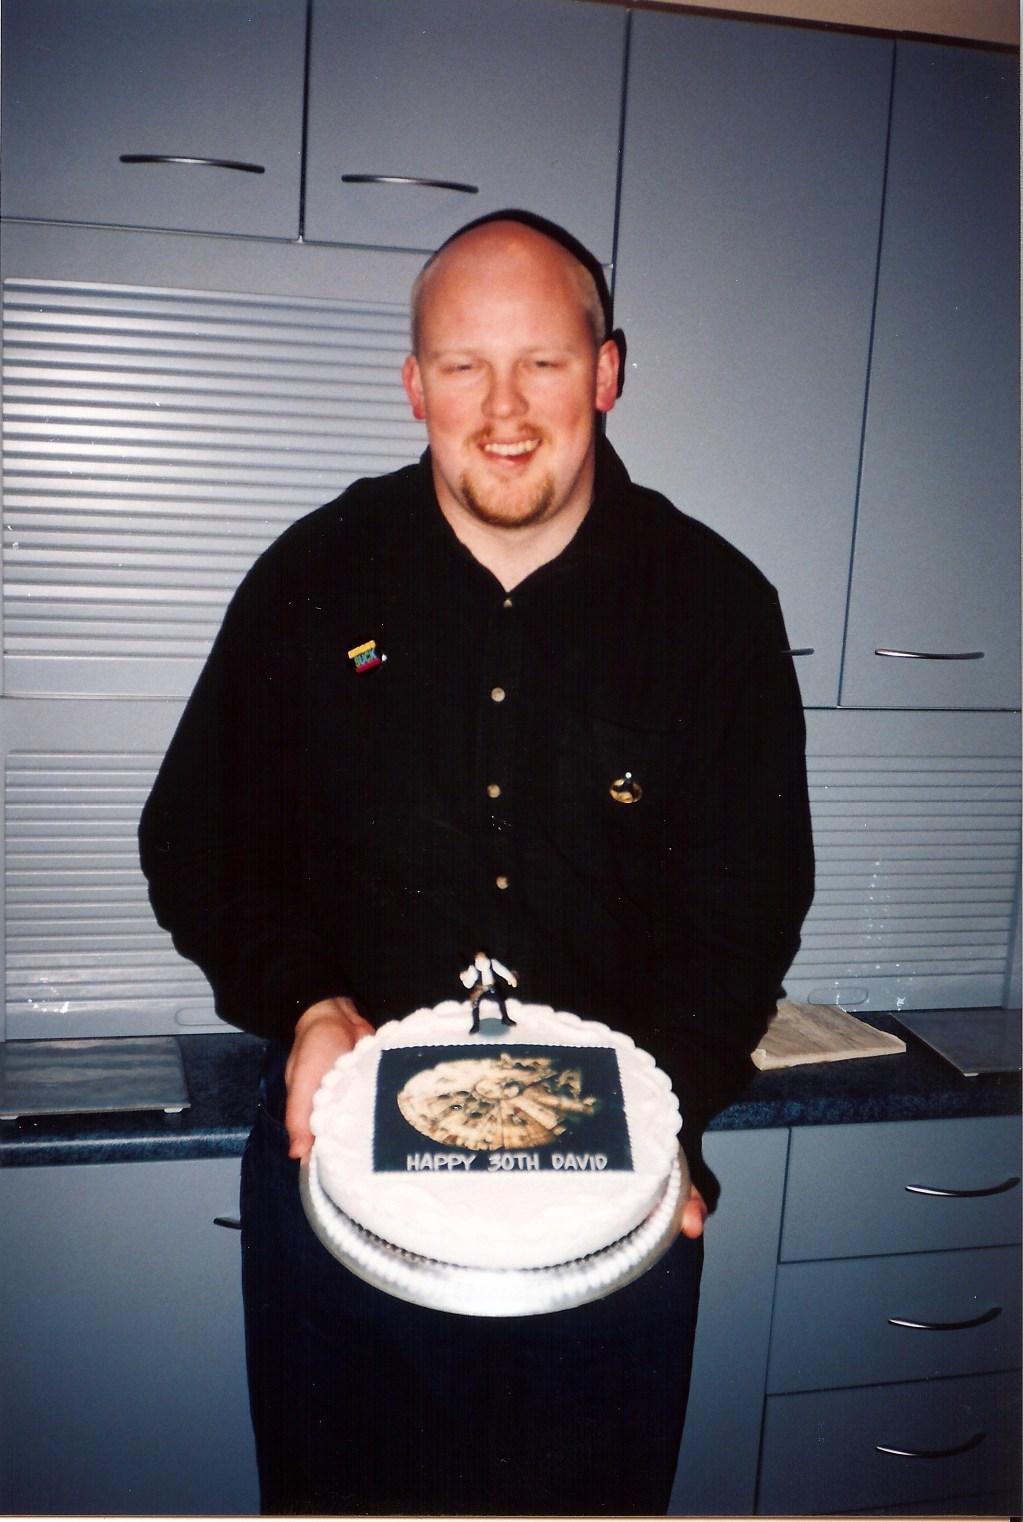 David with 30th birthday cake